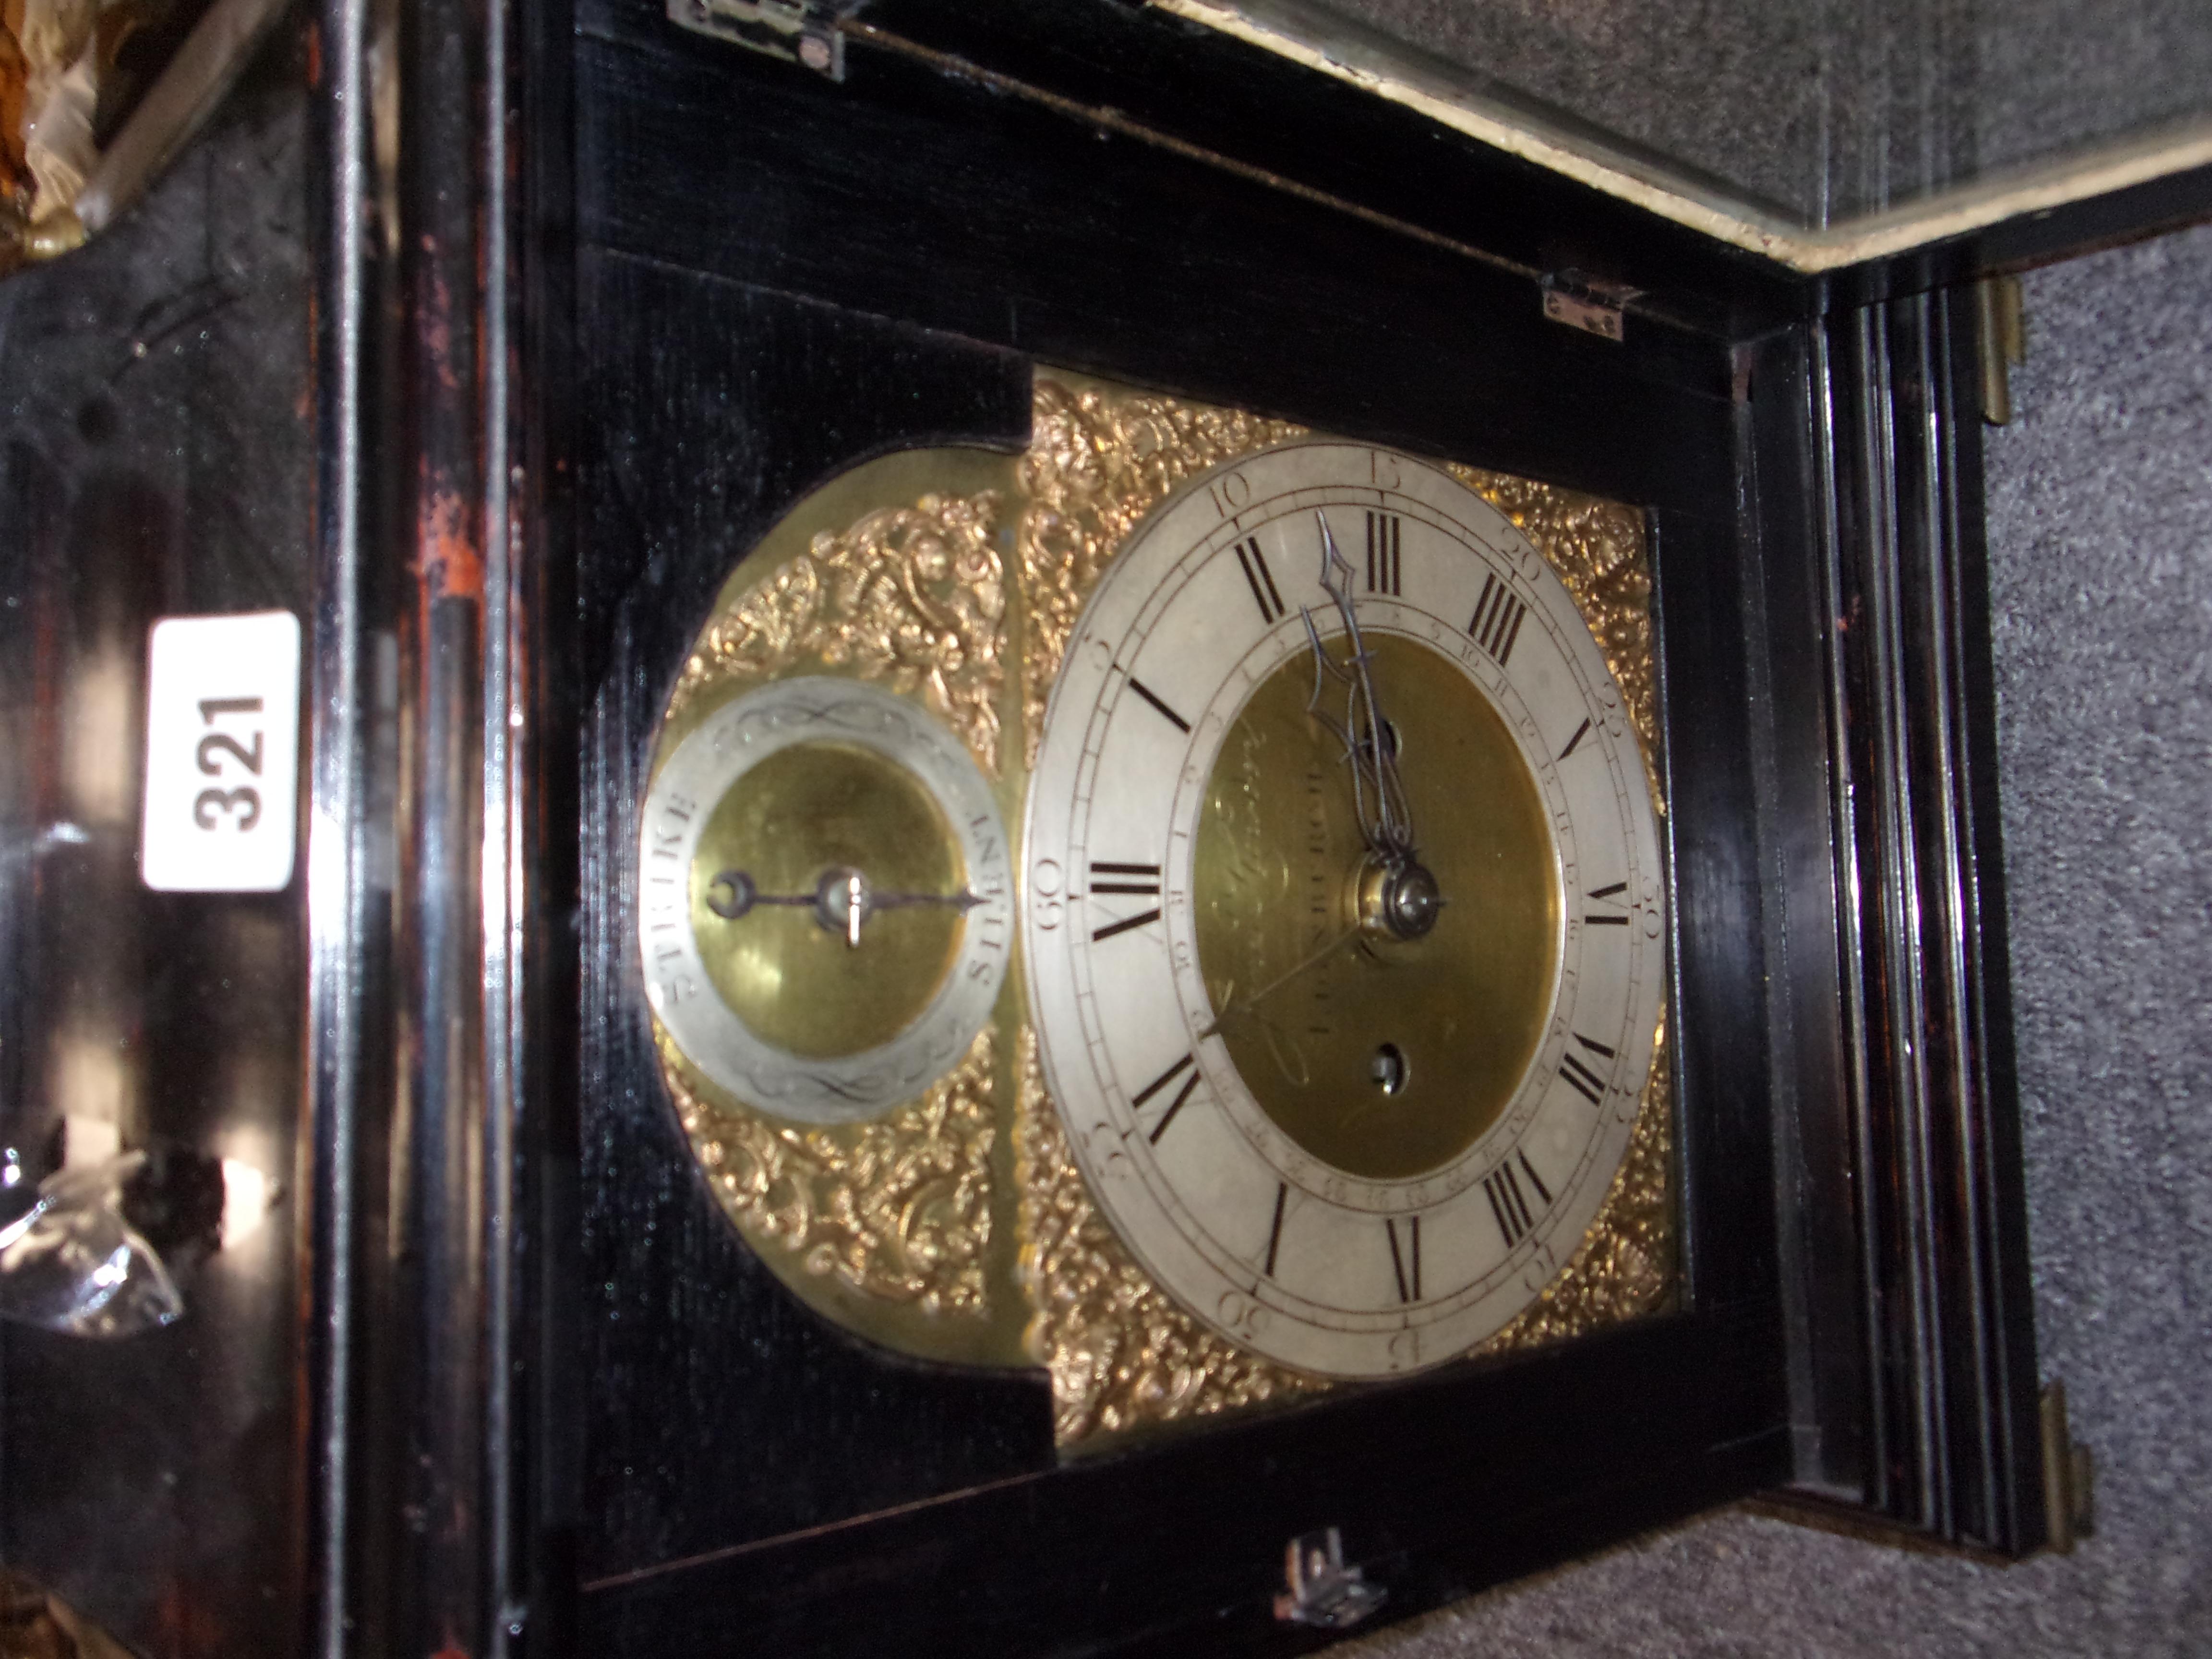 LATE 18C BRACKET CLOCK - Image 4 of 11